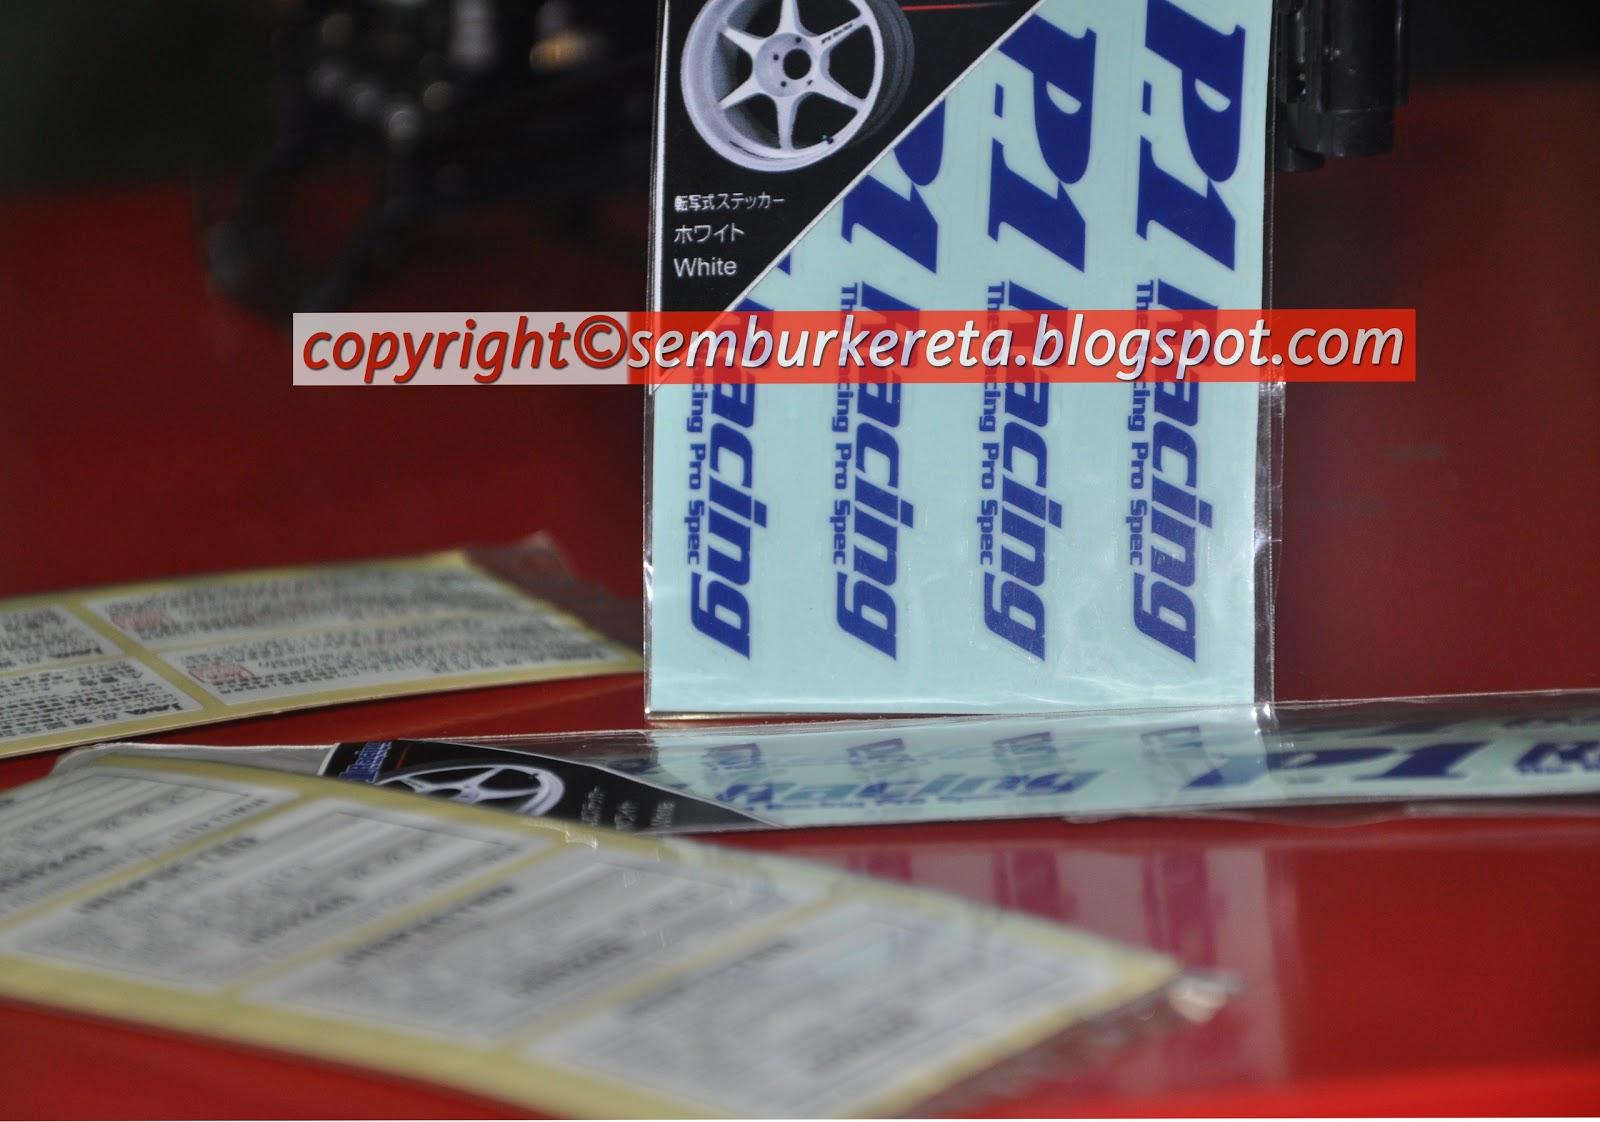 Ssr Vinyl Graphics P T Cruiser Chevy Hhr Ssr Flame Flames